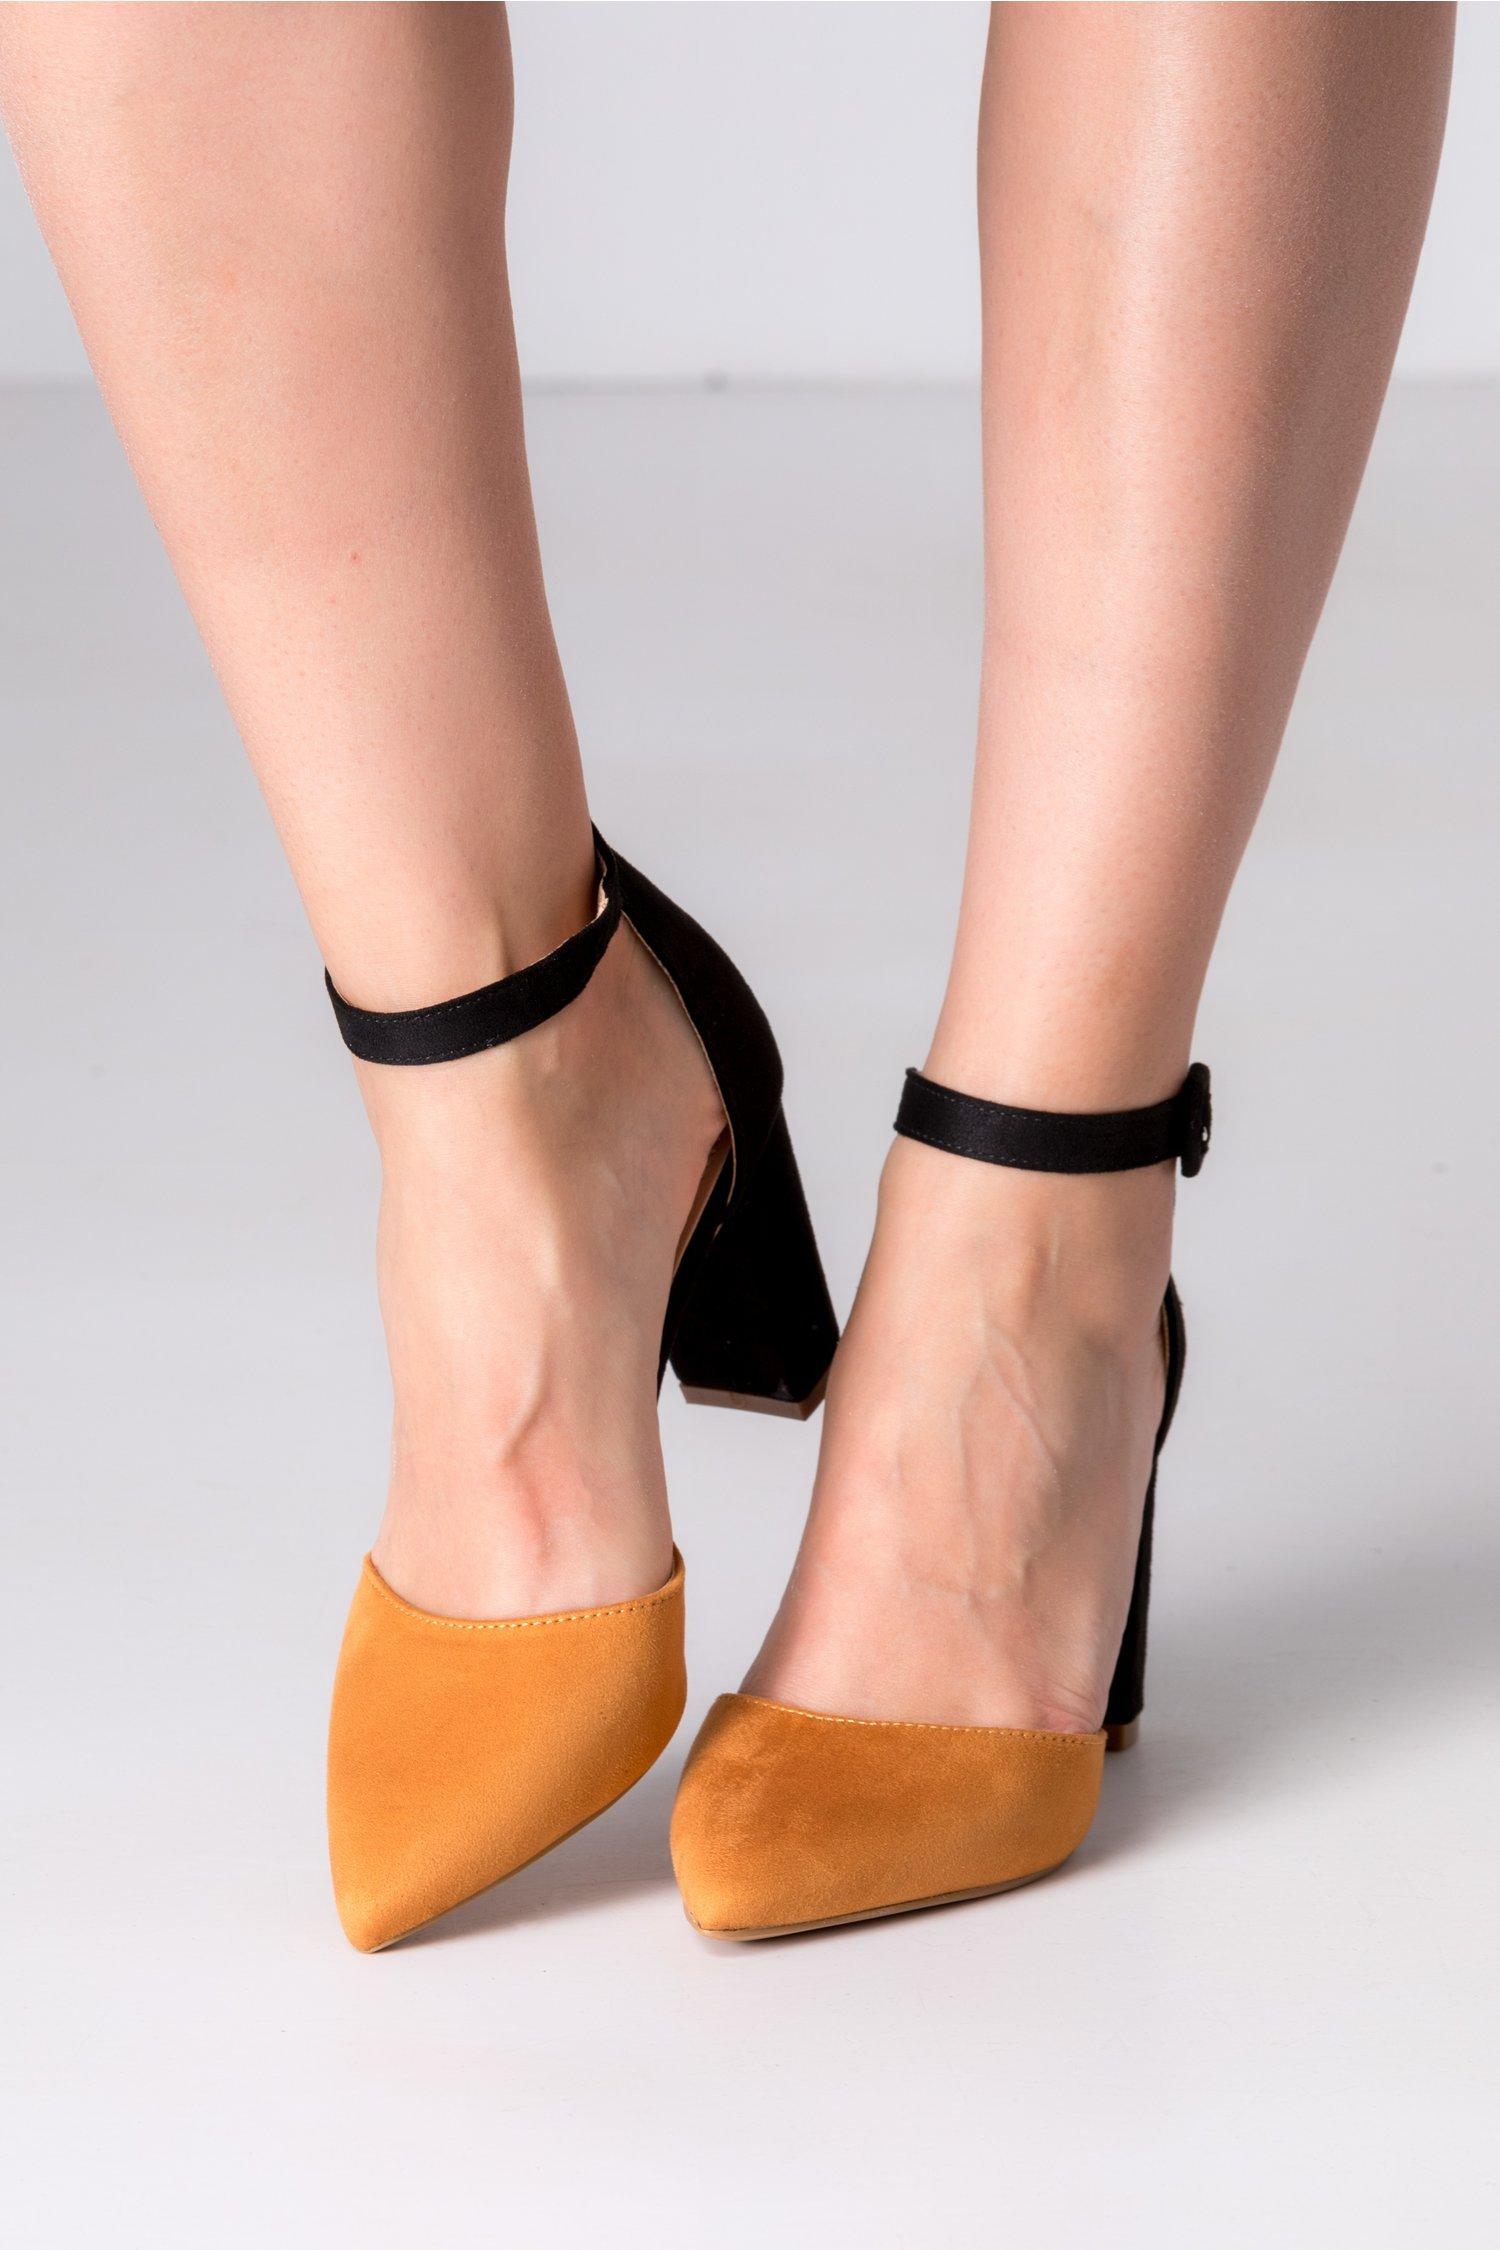 Pantofi dama negru si camel cu bareta